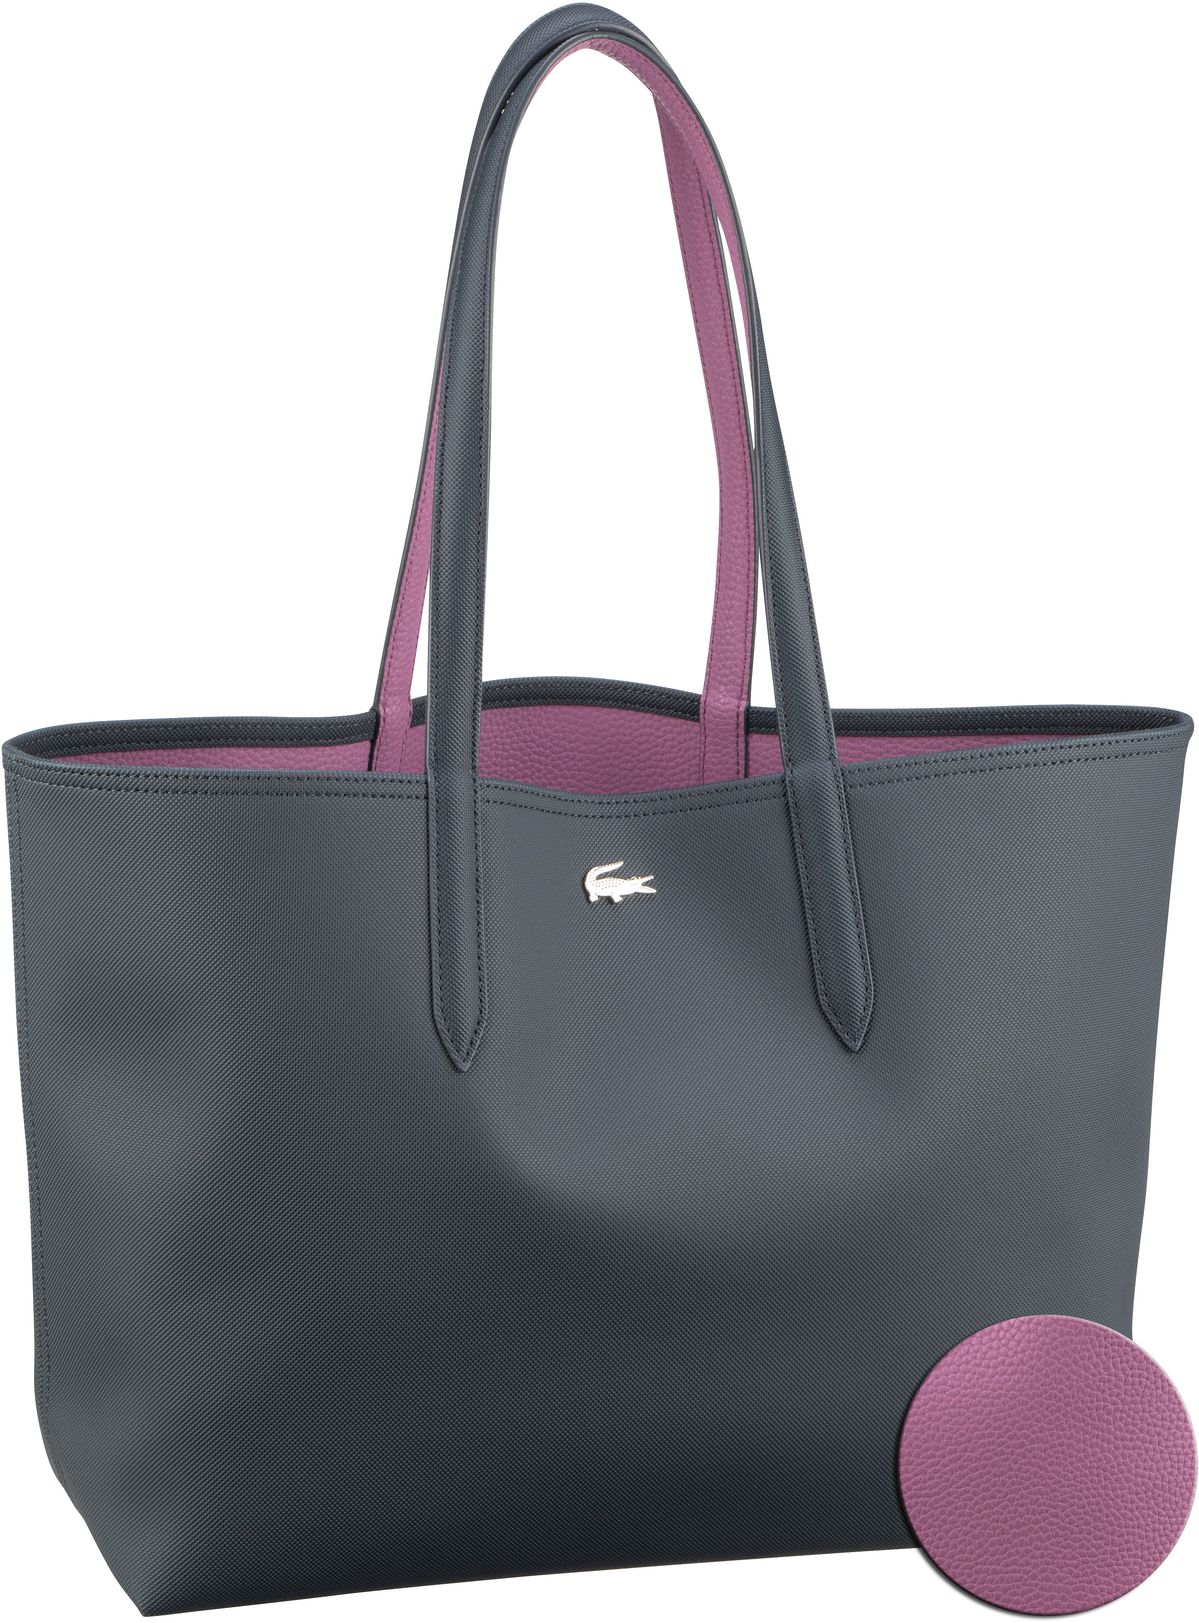 Shopper Anna Shopping Bag 2142 Ebony/Orchid (innen: Violett)